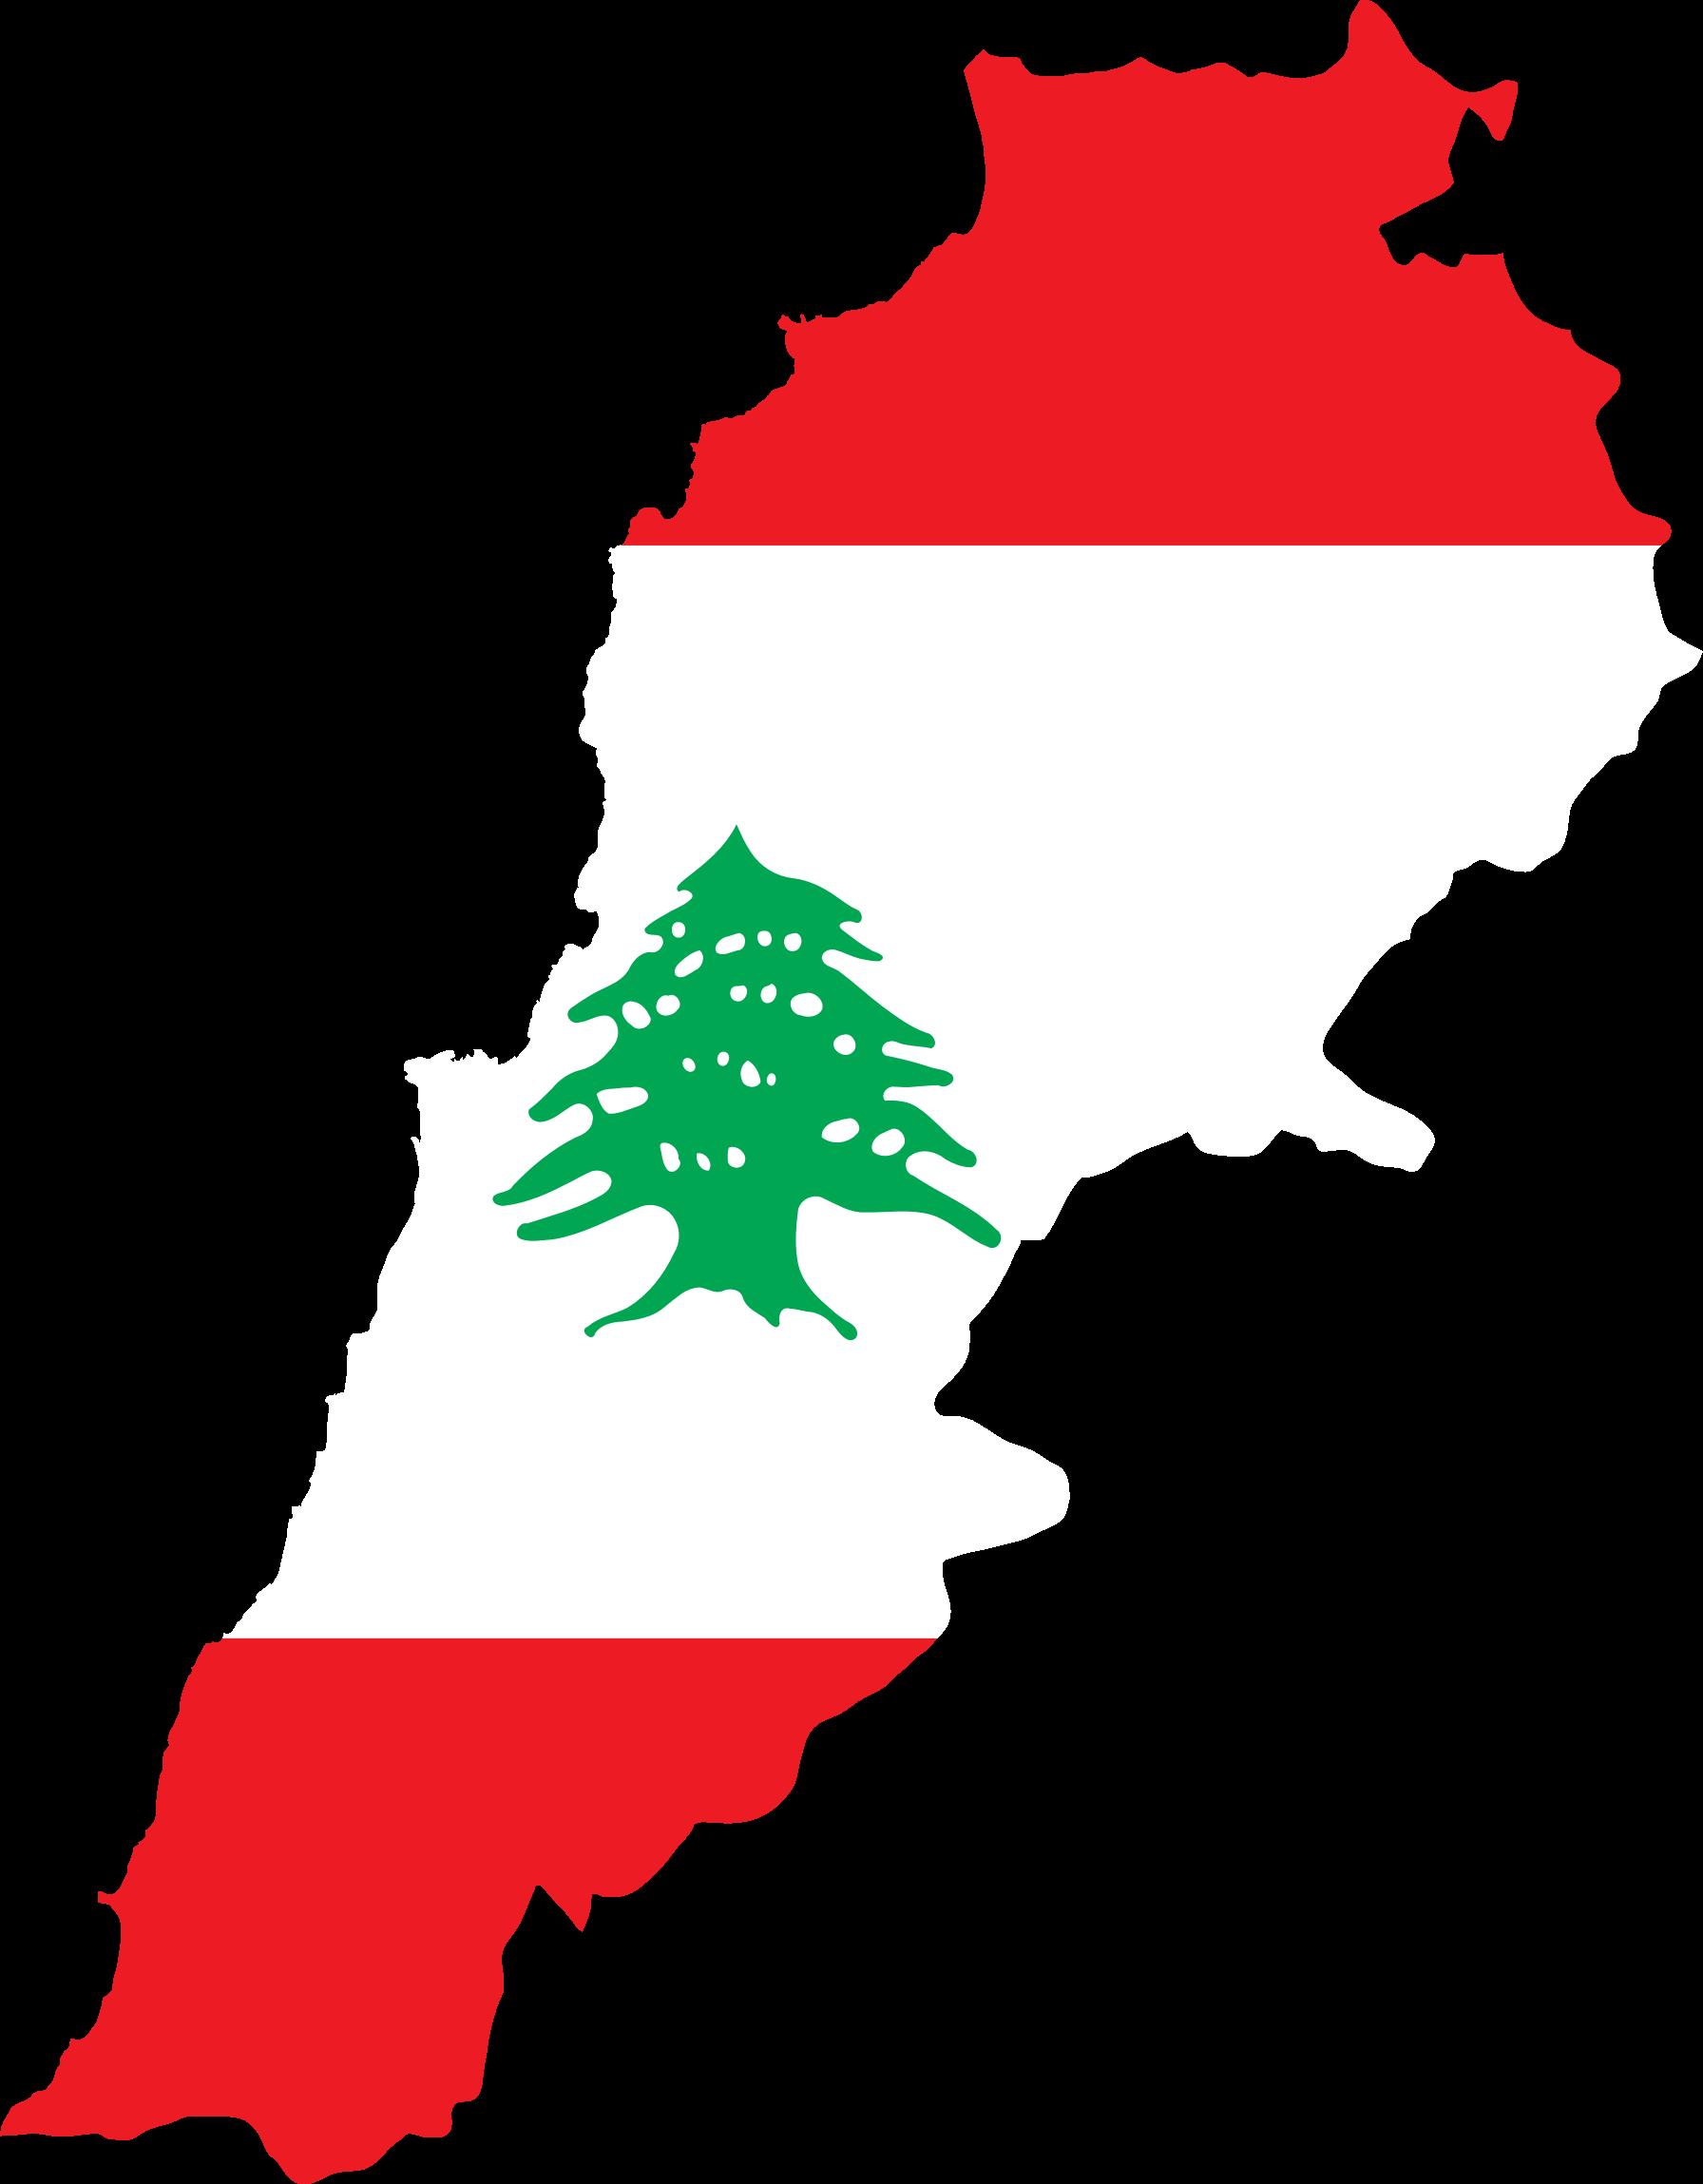 Lebanon Map Clipart.